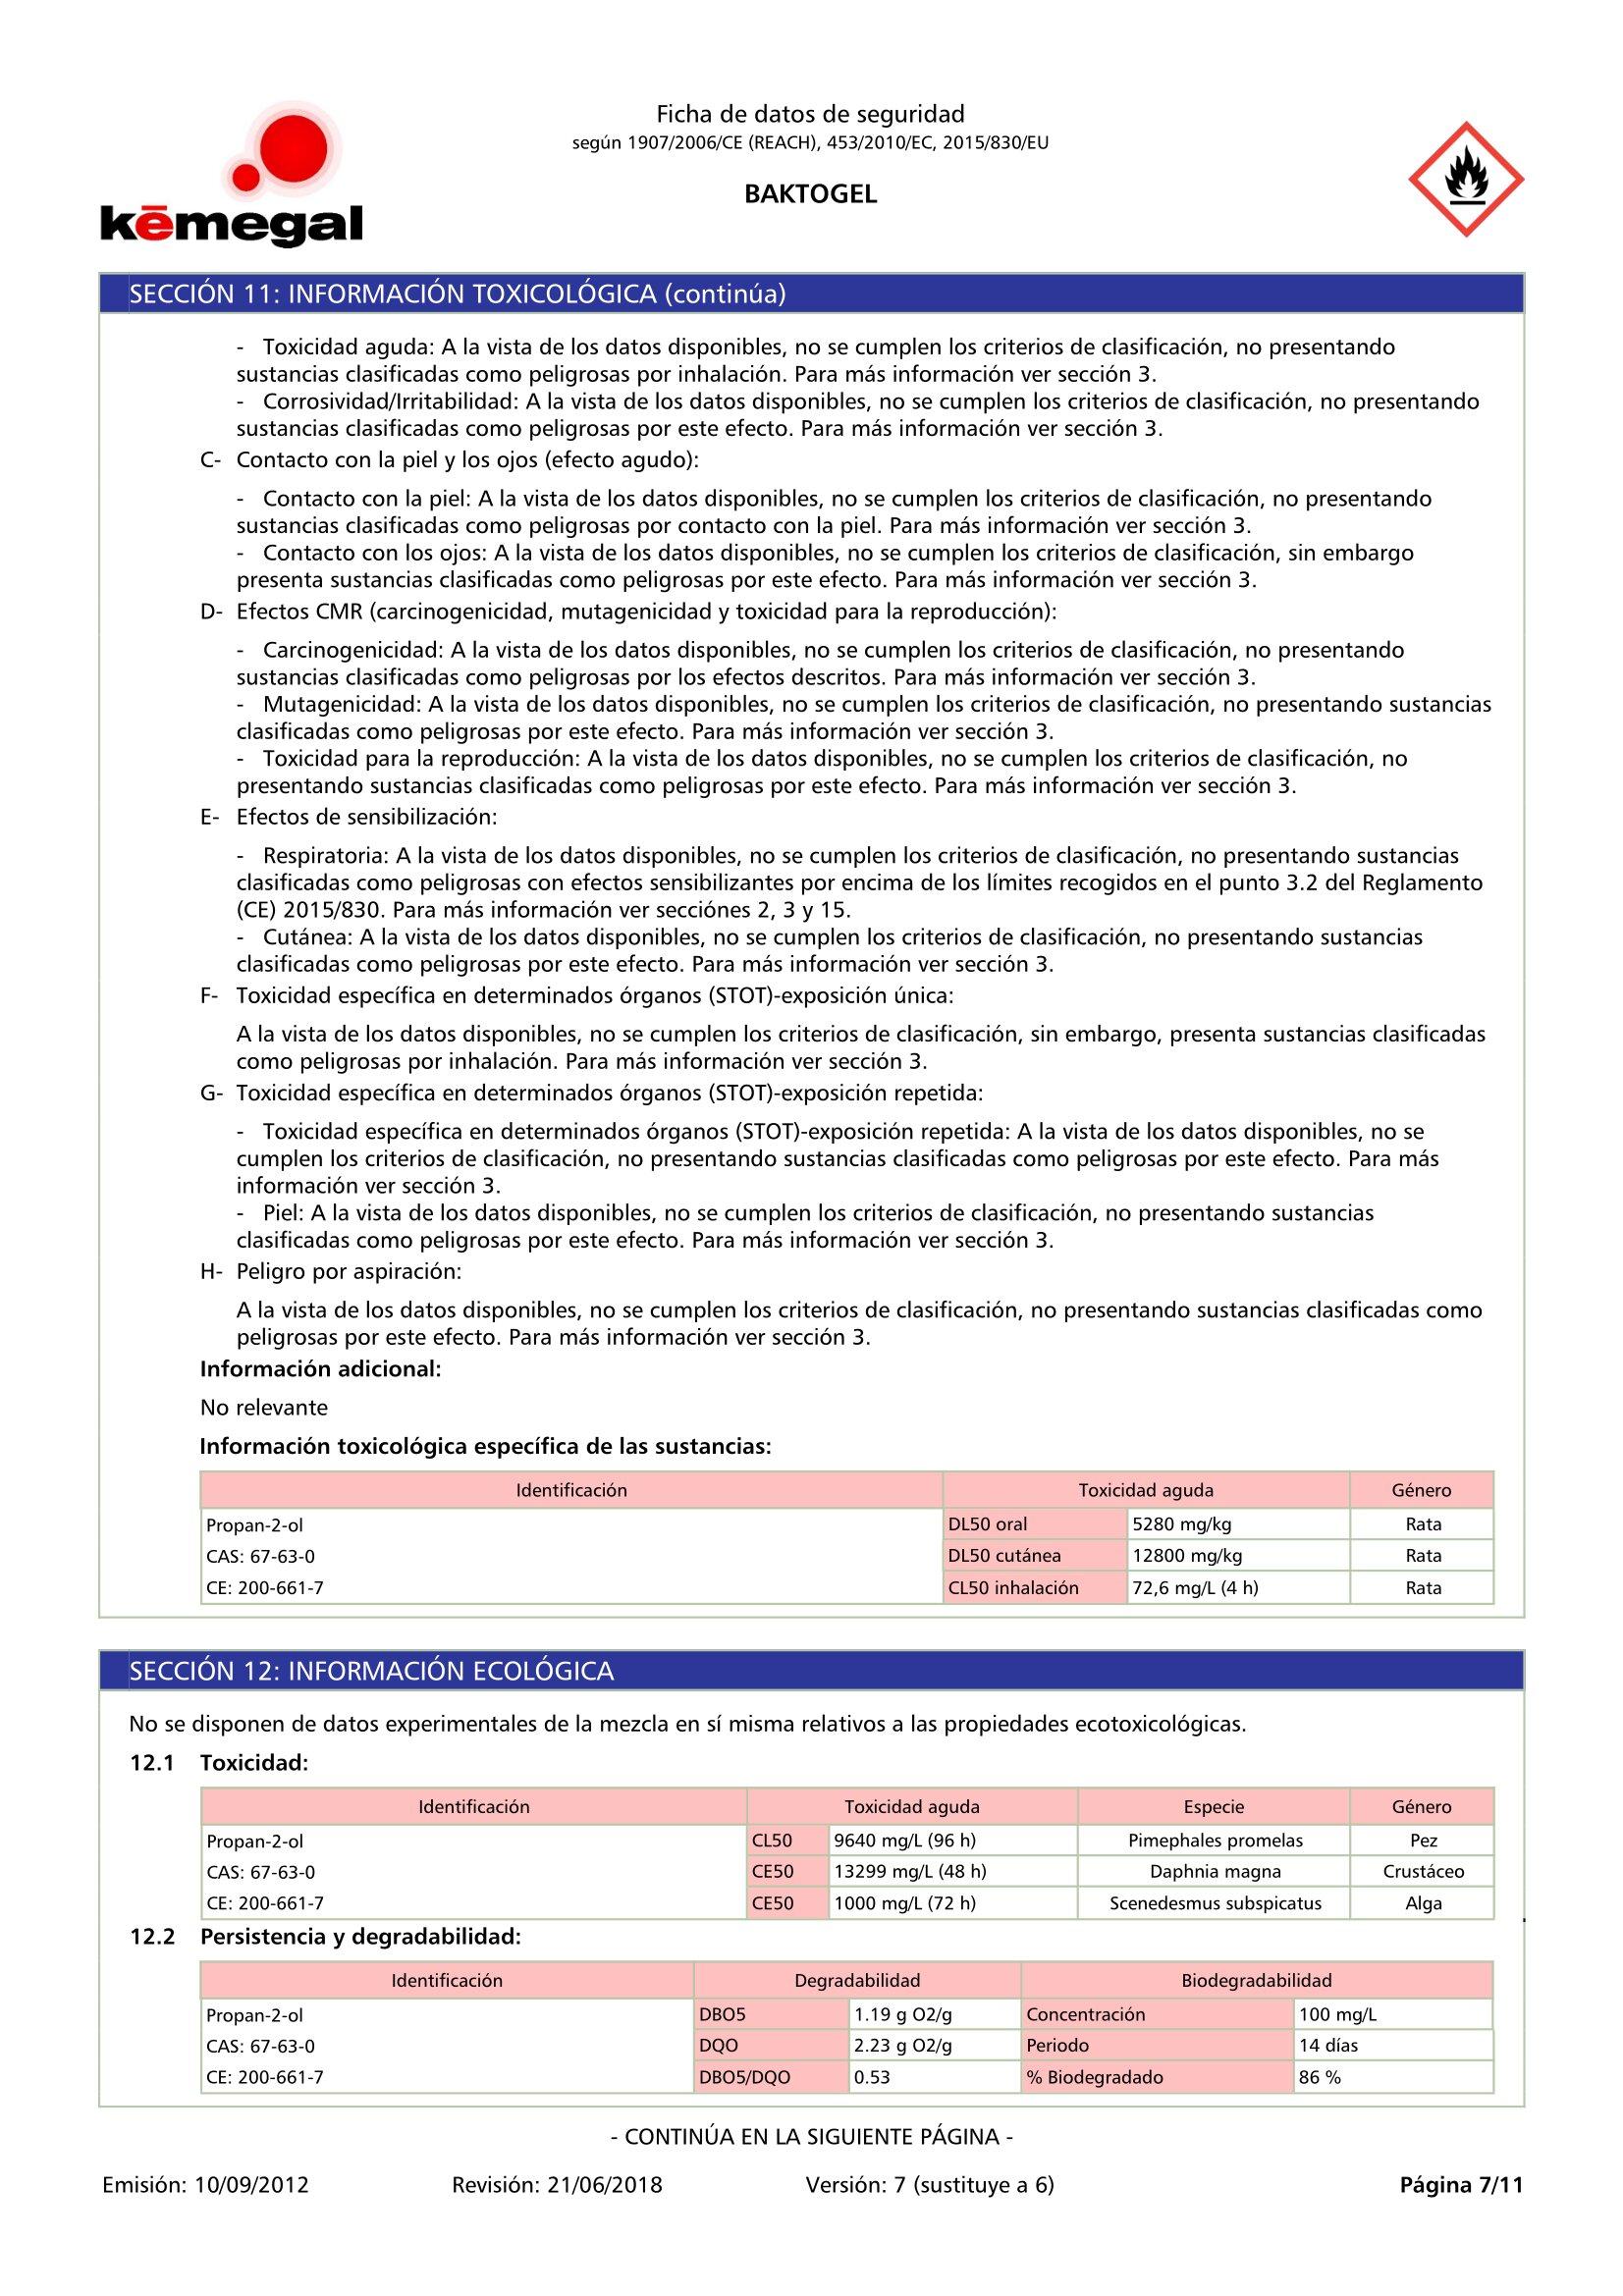 SAFIR FISIOTERAPIA CORUA BAKTOGEL_0007jpg